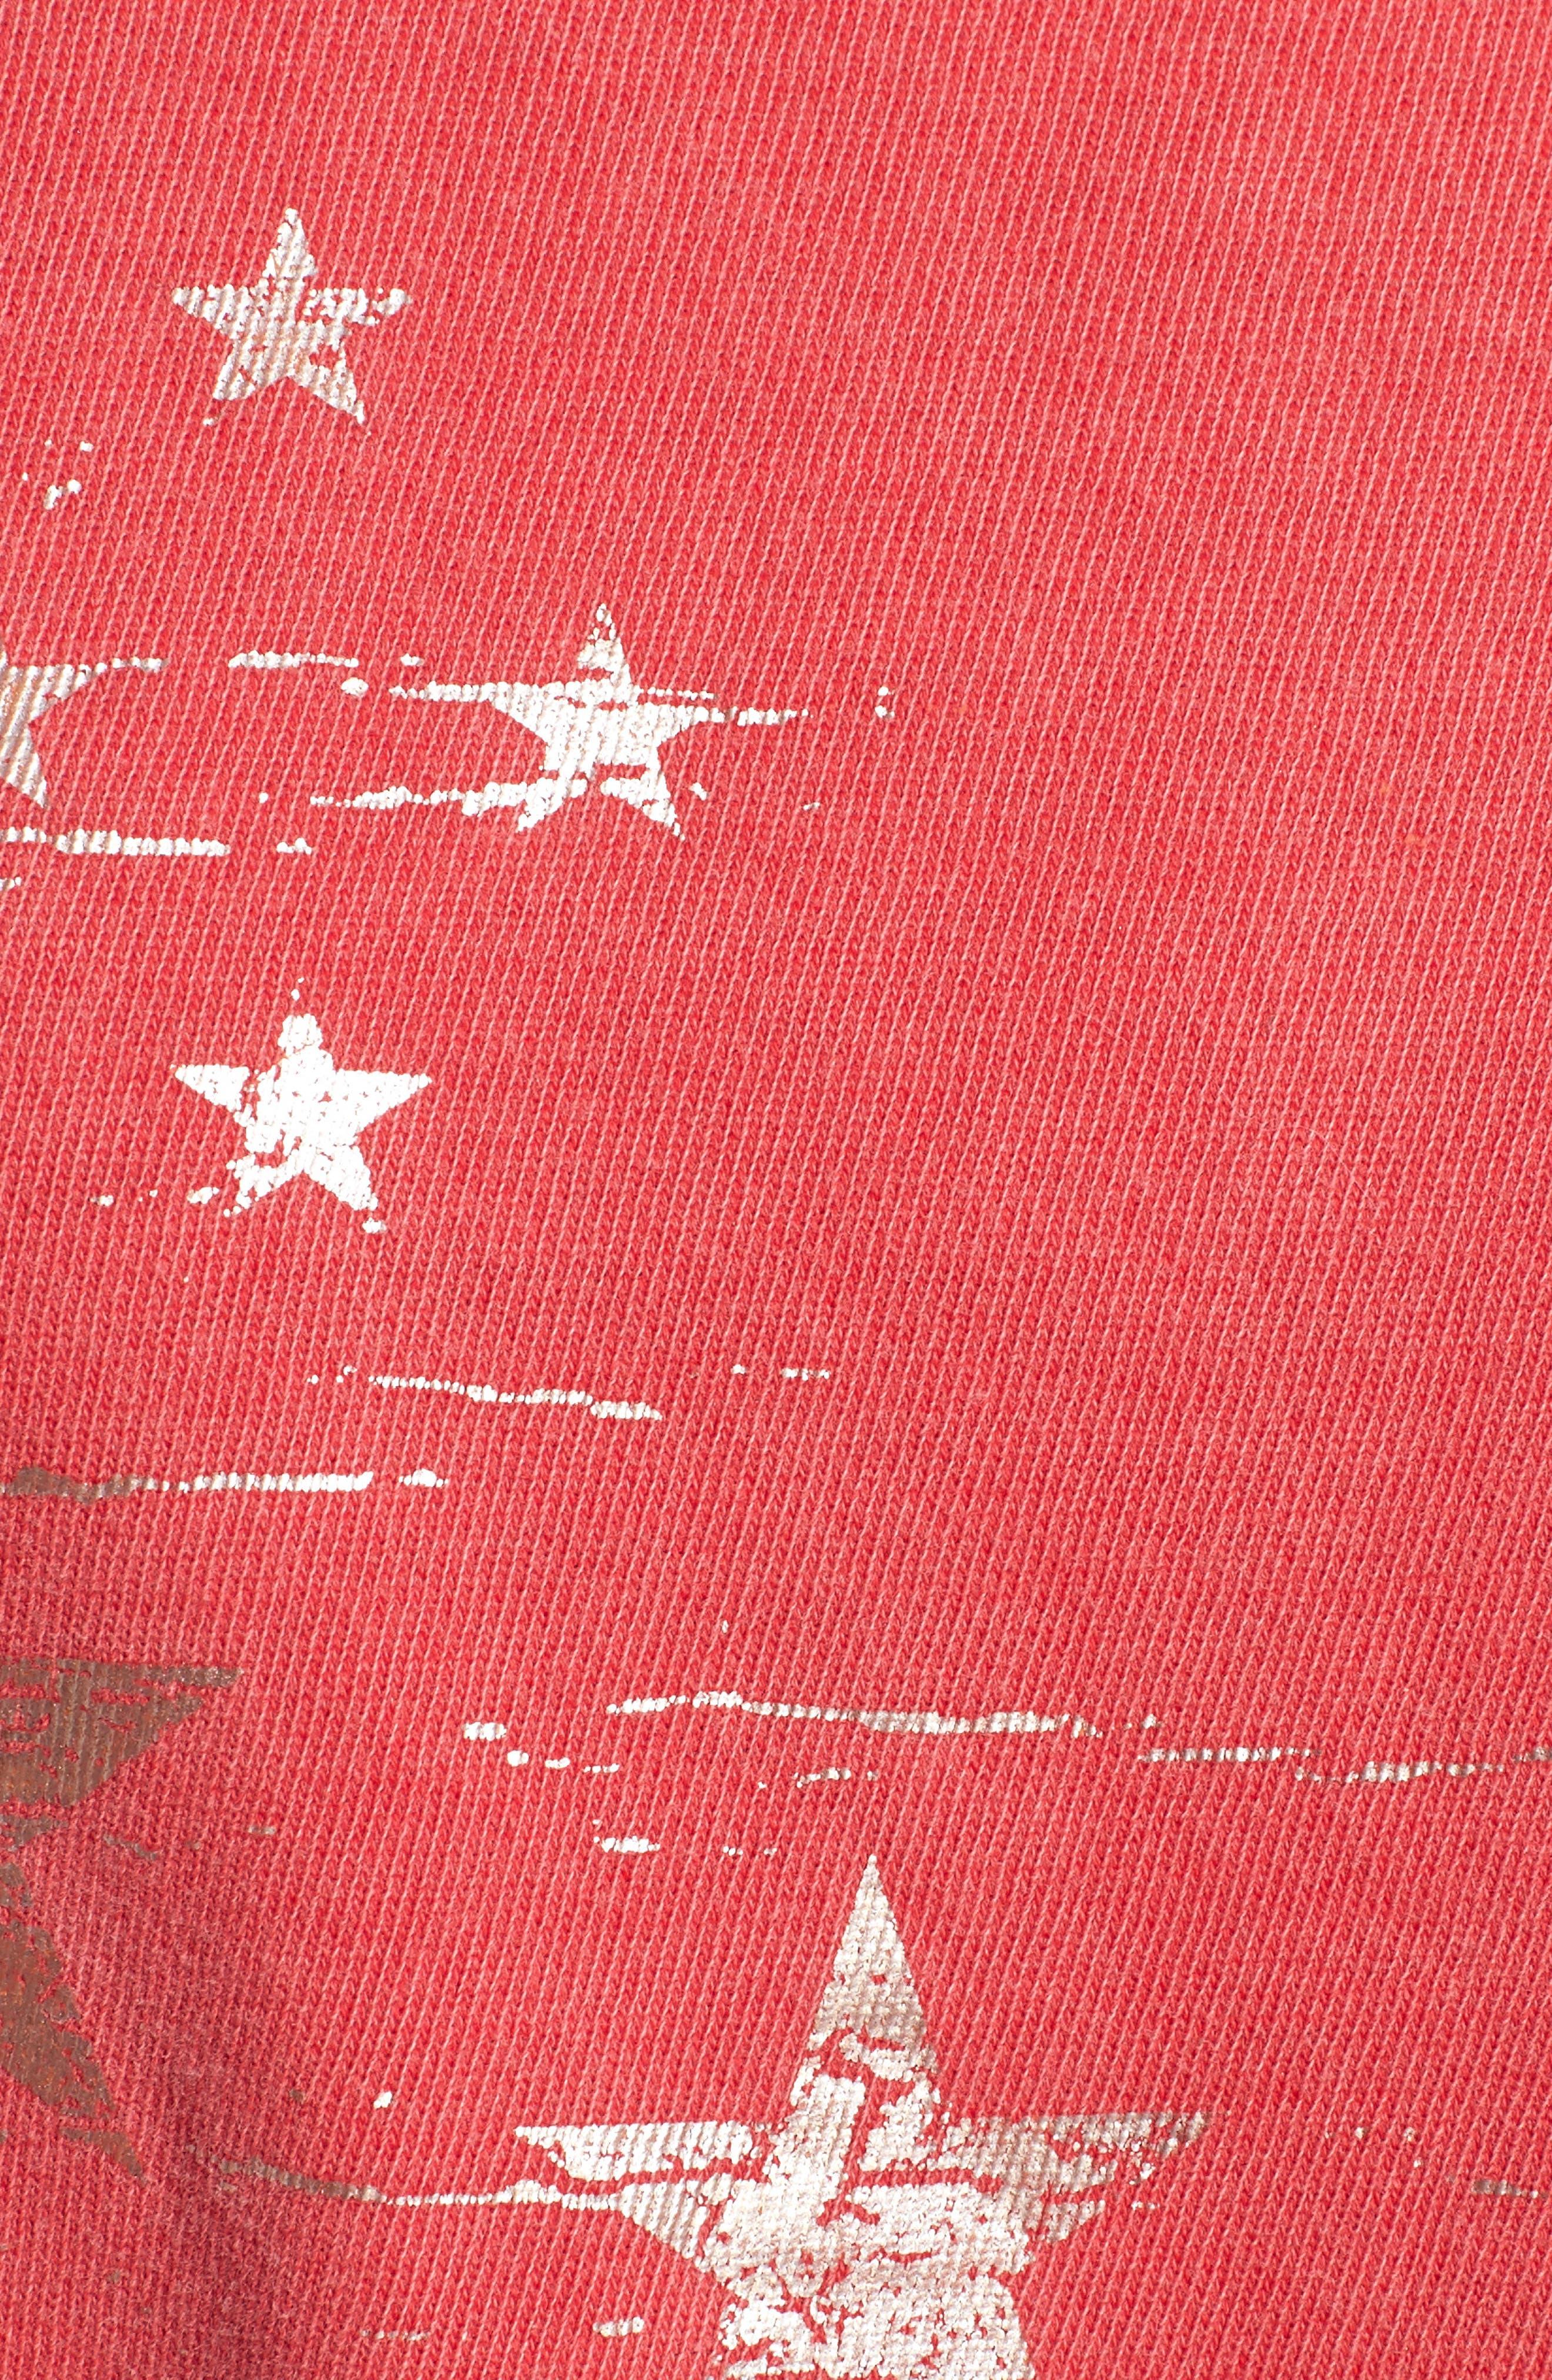 Foil Star Sweatshirt,                             Alternate thumbnail 5, color,                             600